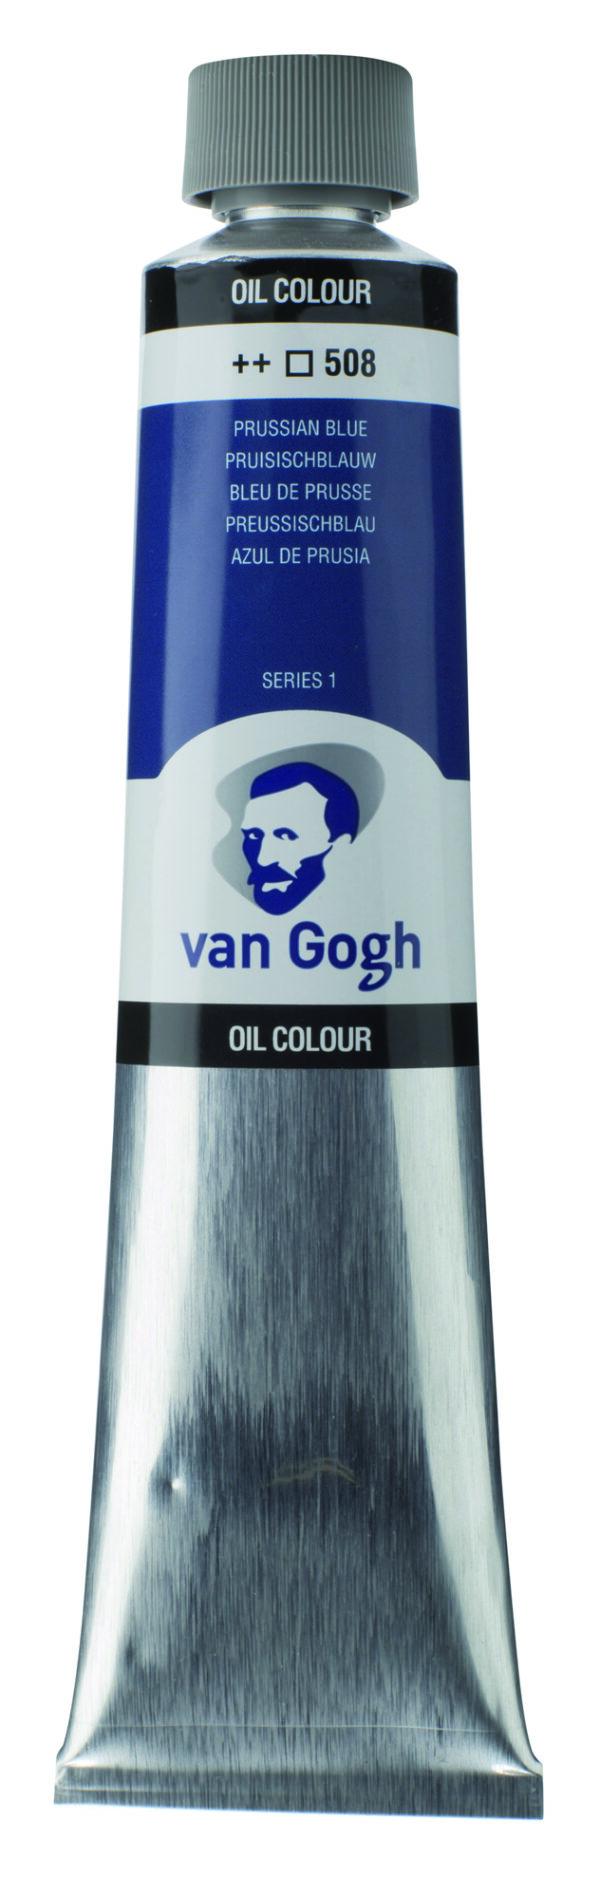 Van Gogh 508 Prussian blue - 200 ml